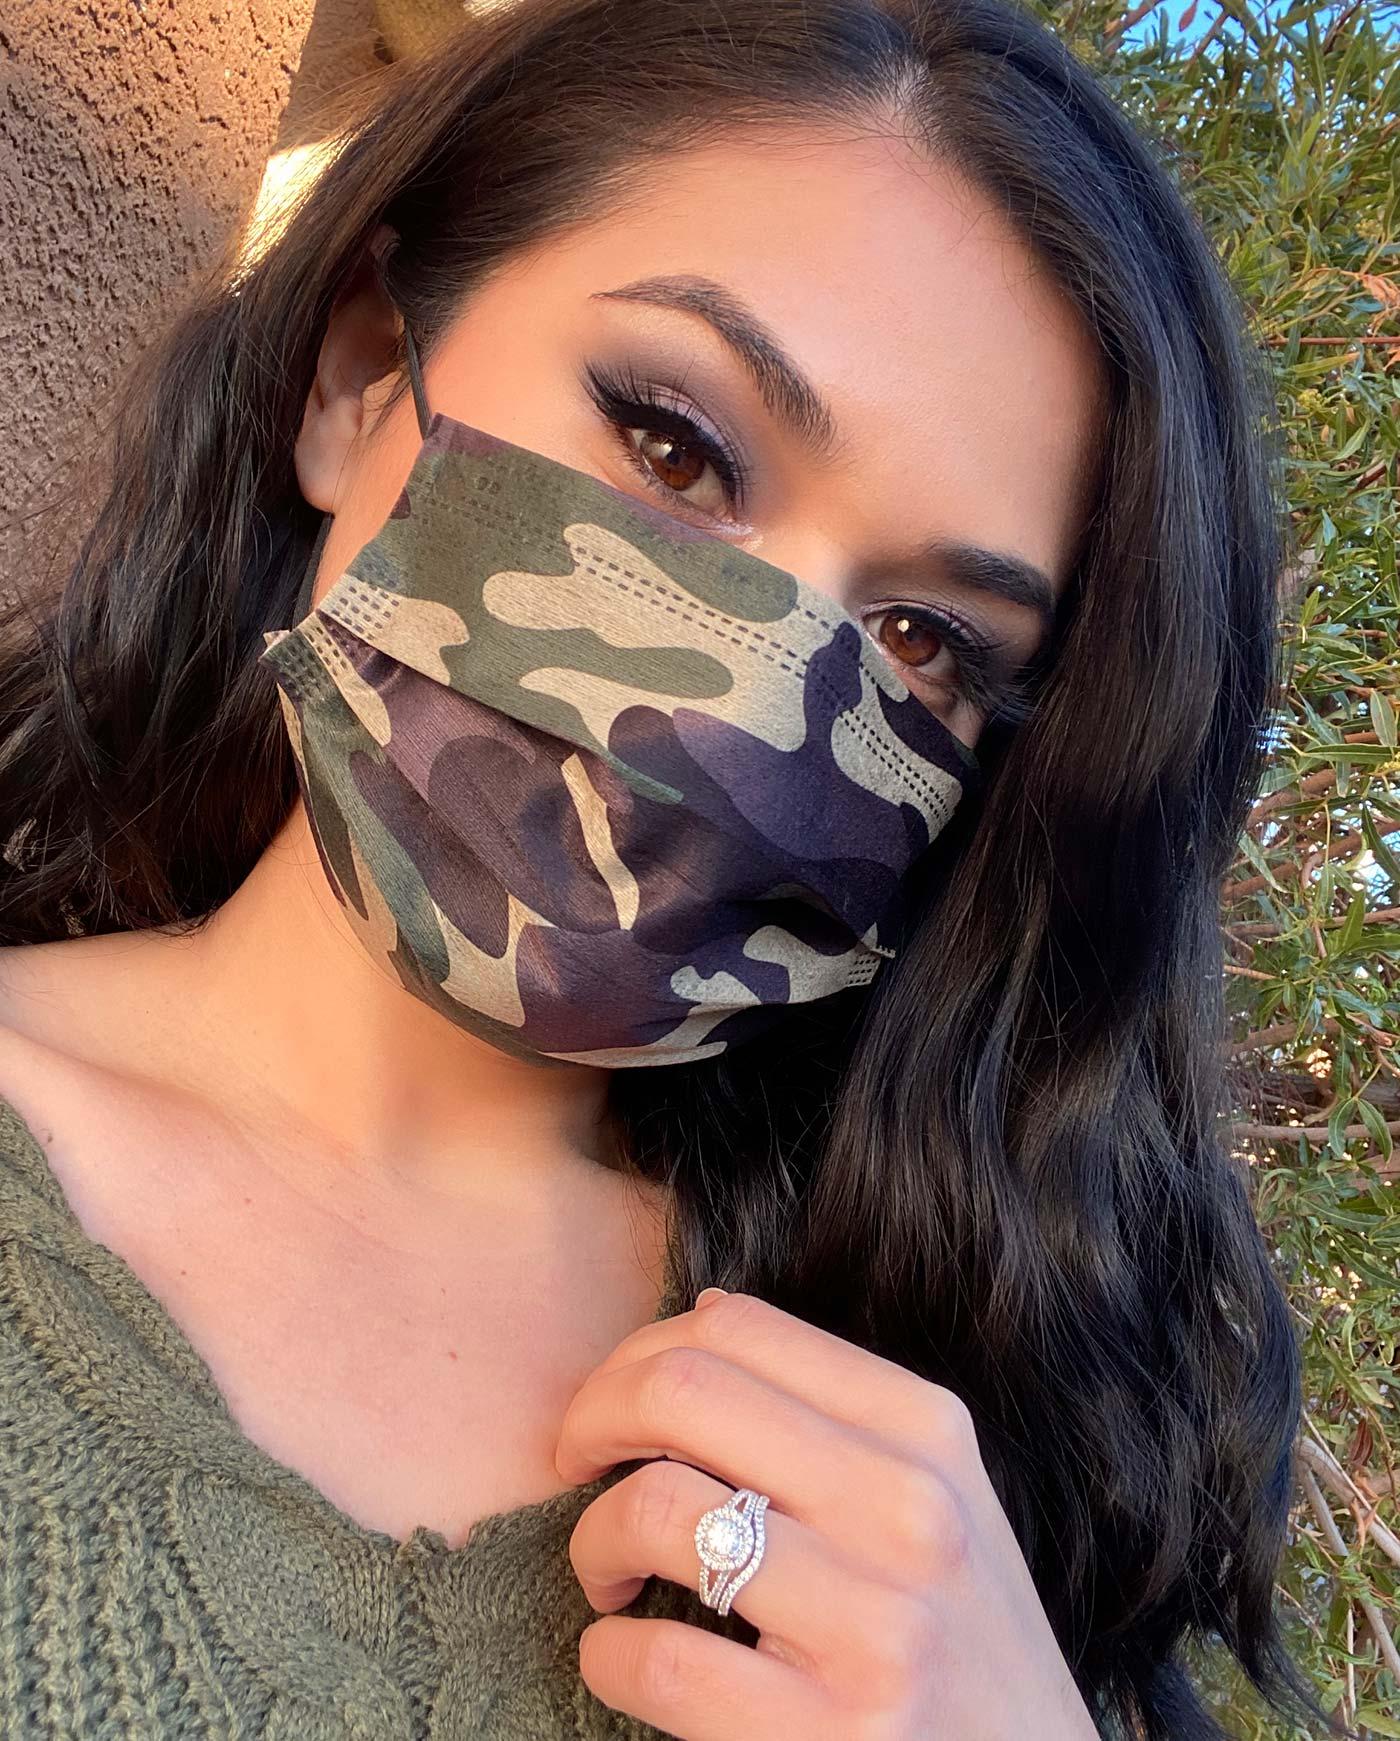 MASKC Disposable Camo Print Face Mask | 2021 Essentials Giveaway: Masks, Makeup & Amazon Gift Card! | Slashed Beauty